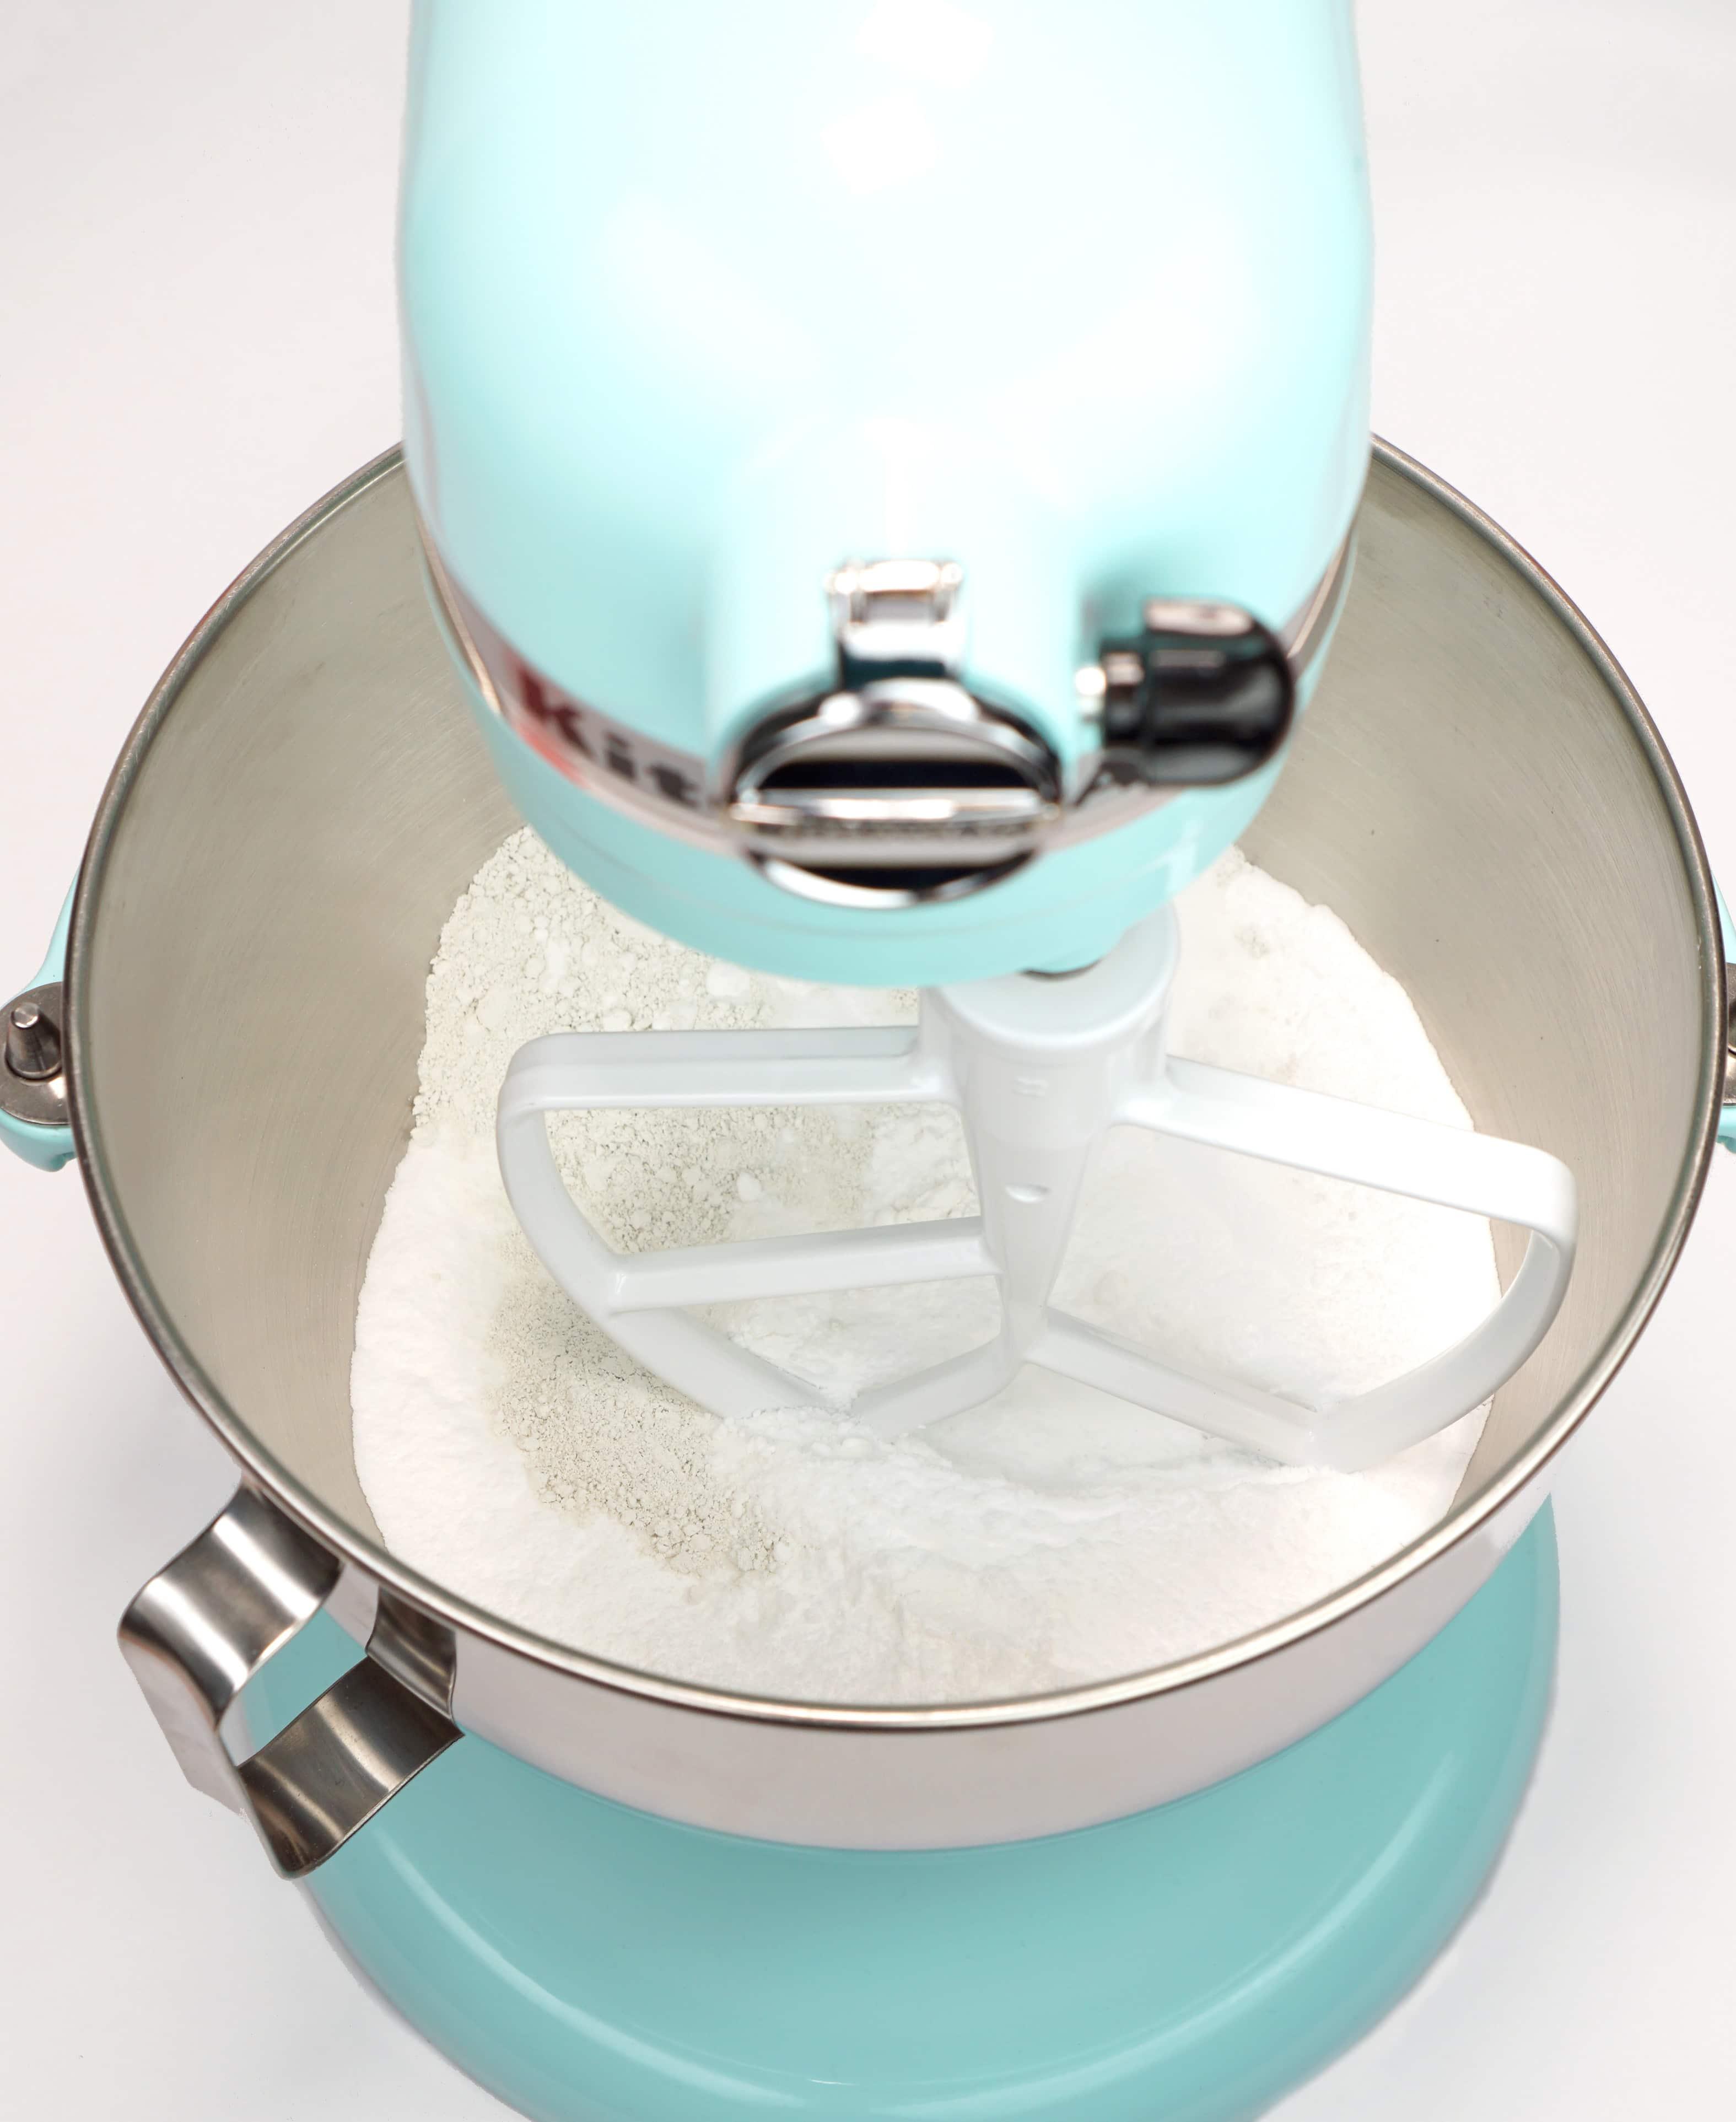 Bath bomb dry ingredients in aqua stand mixer